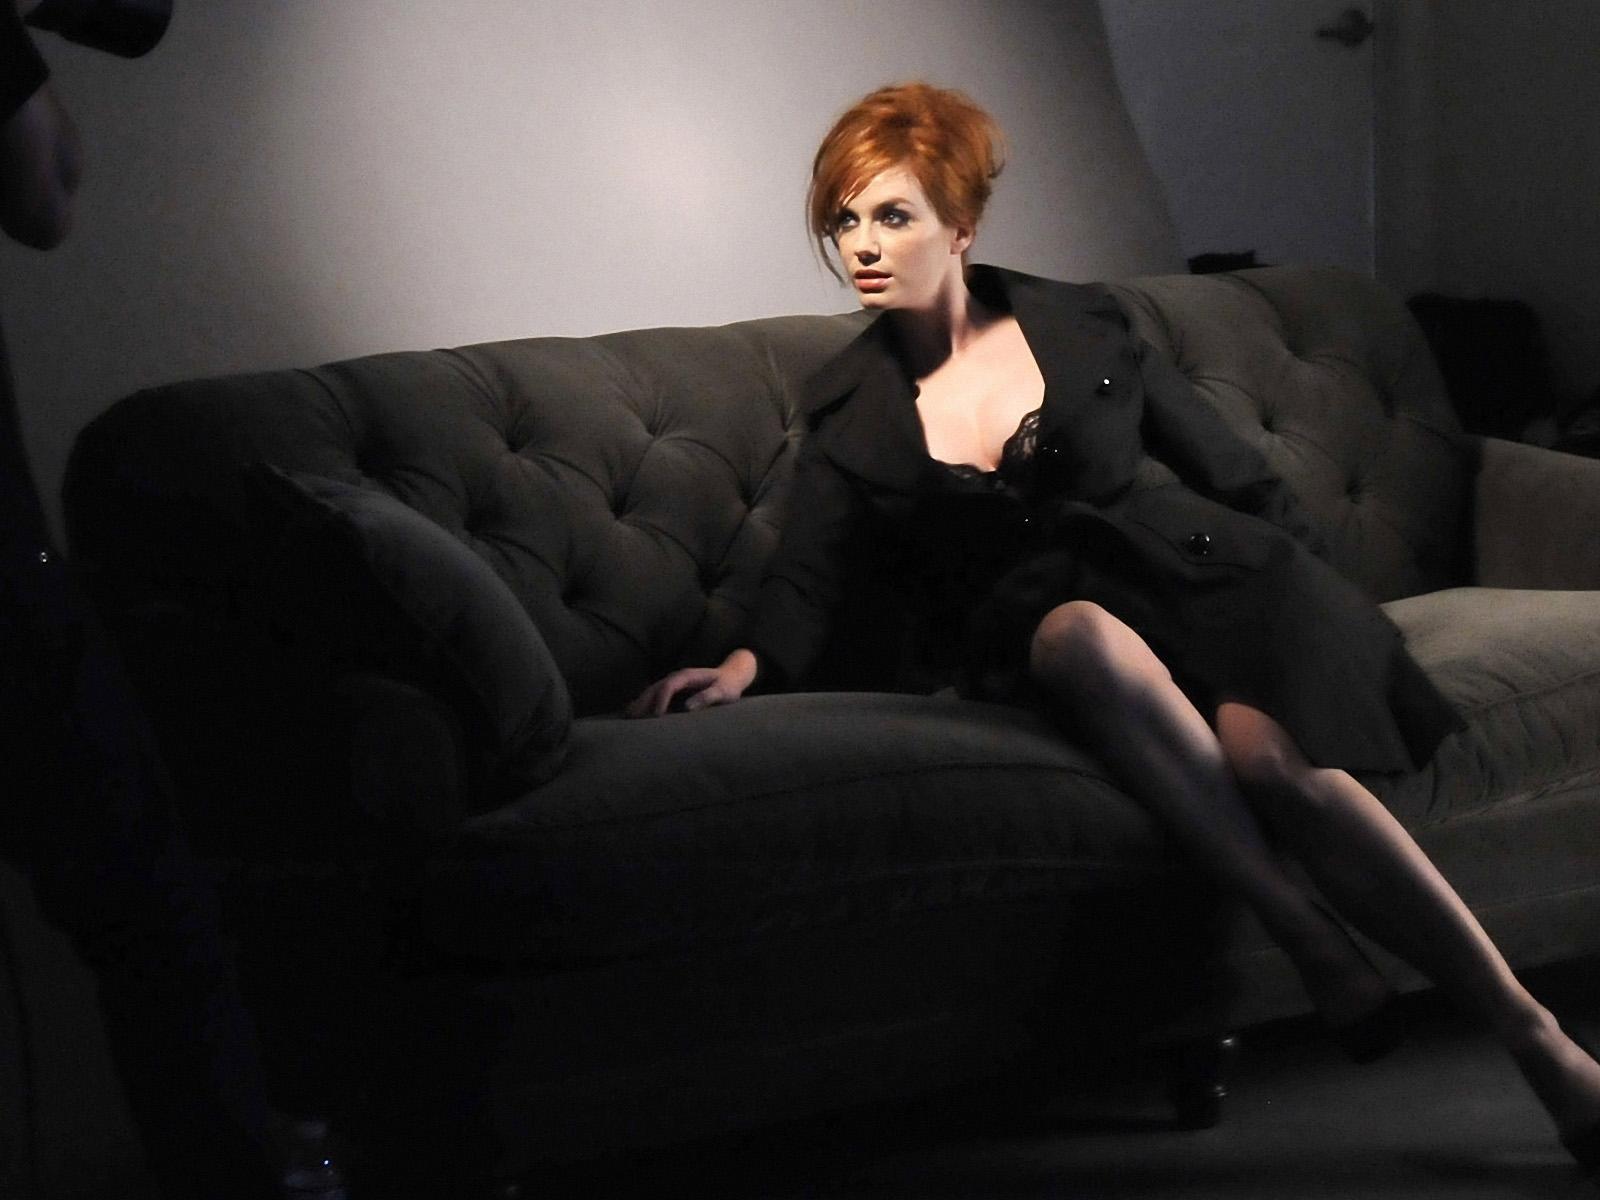 25 The Best Of Christina Hendricks Sexy Images 1600x1200